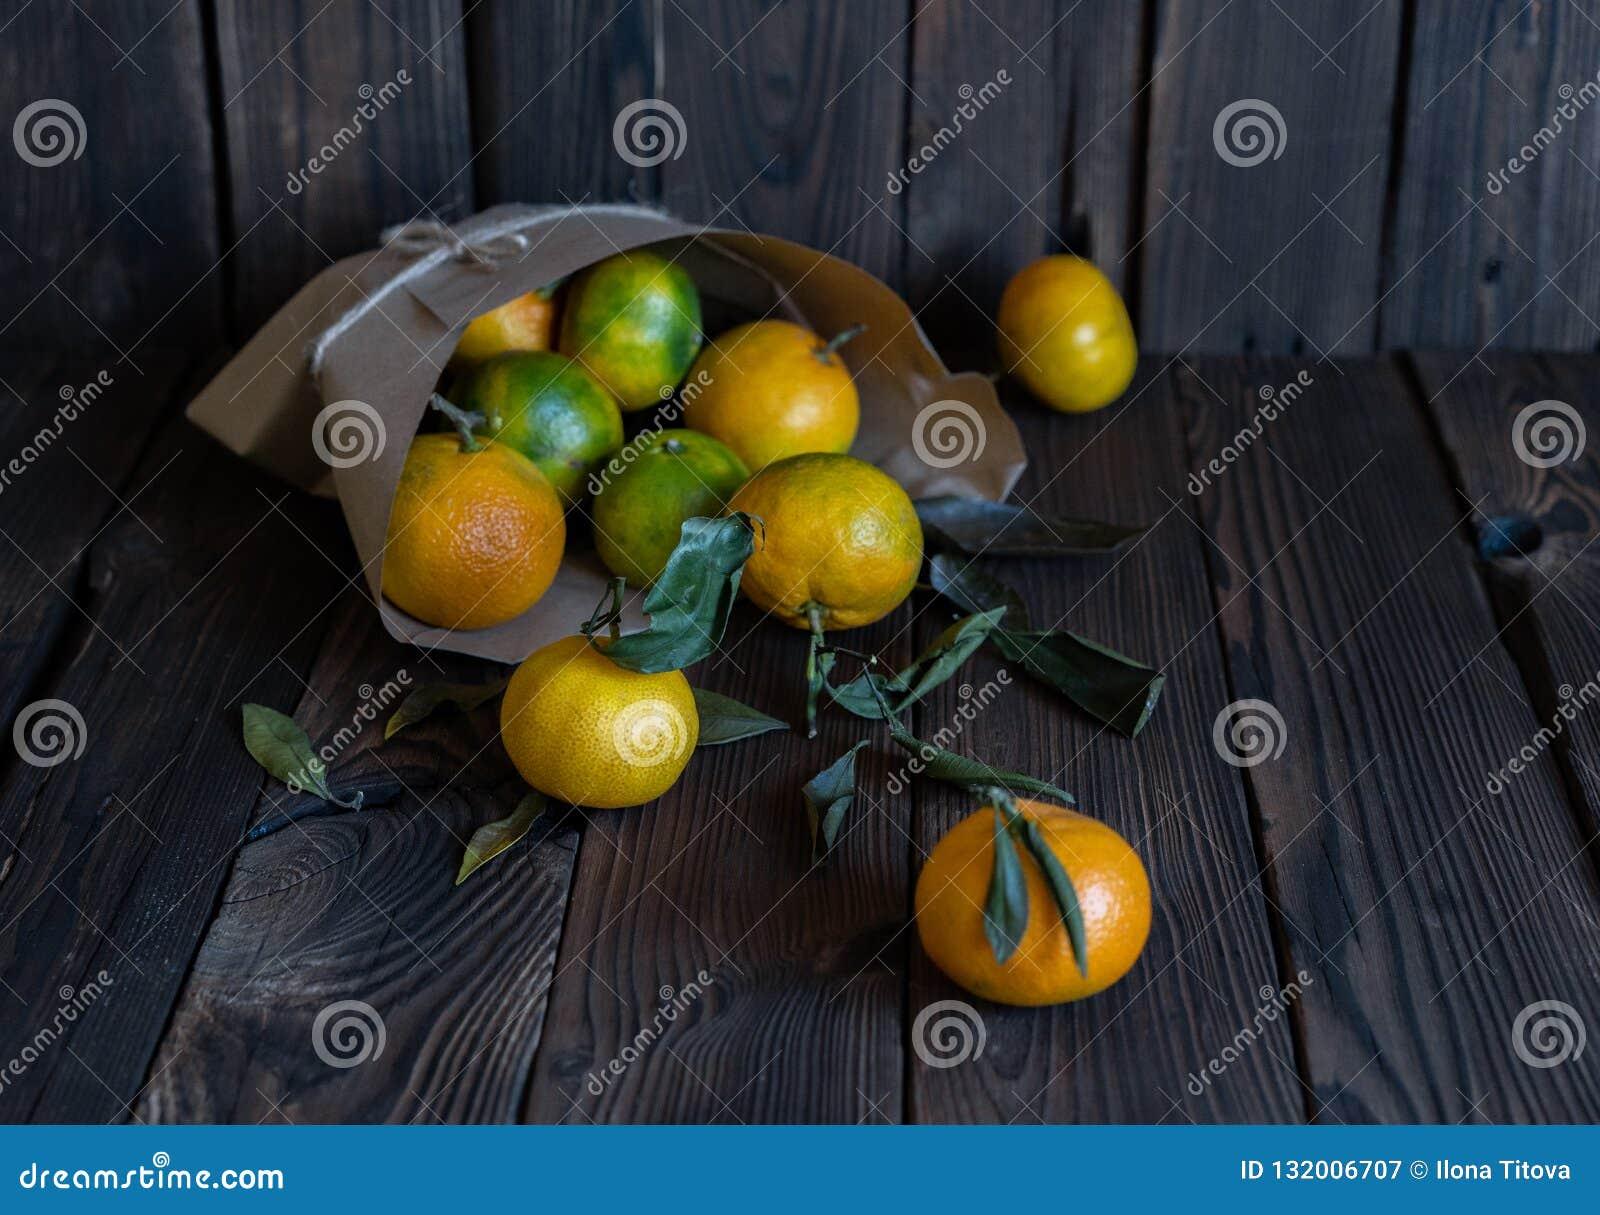 Arance dei mandarini, mandarini, clementine, agrumi